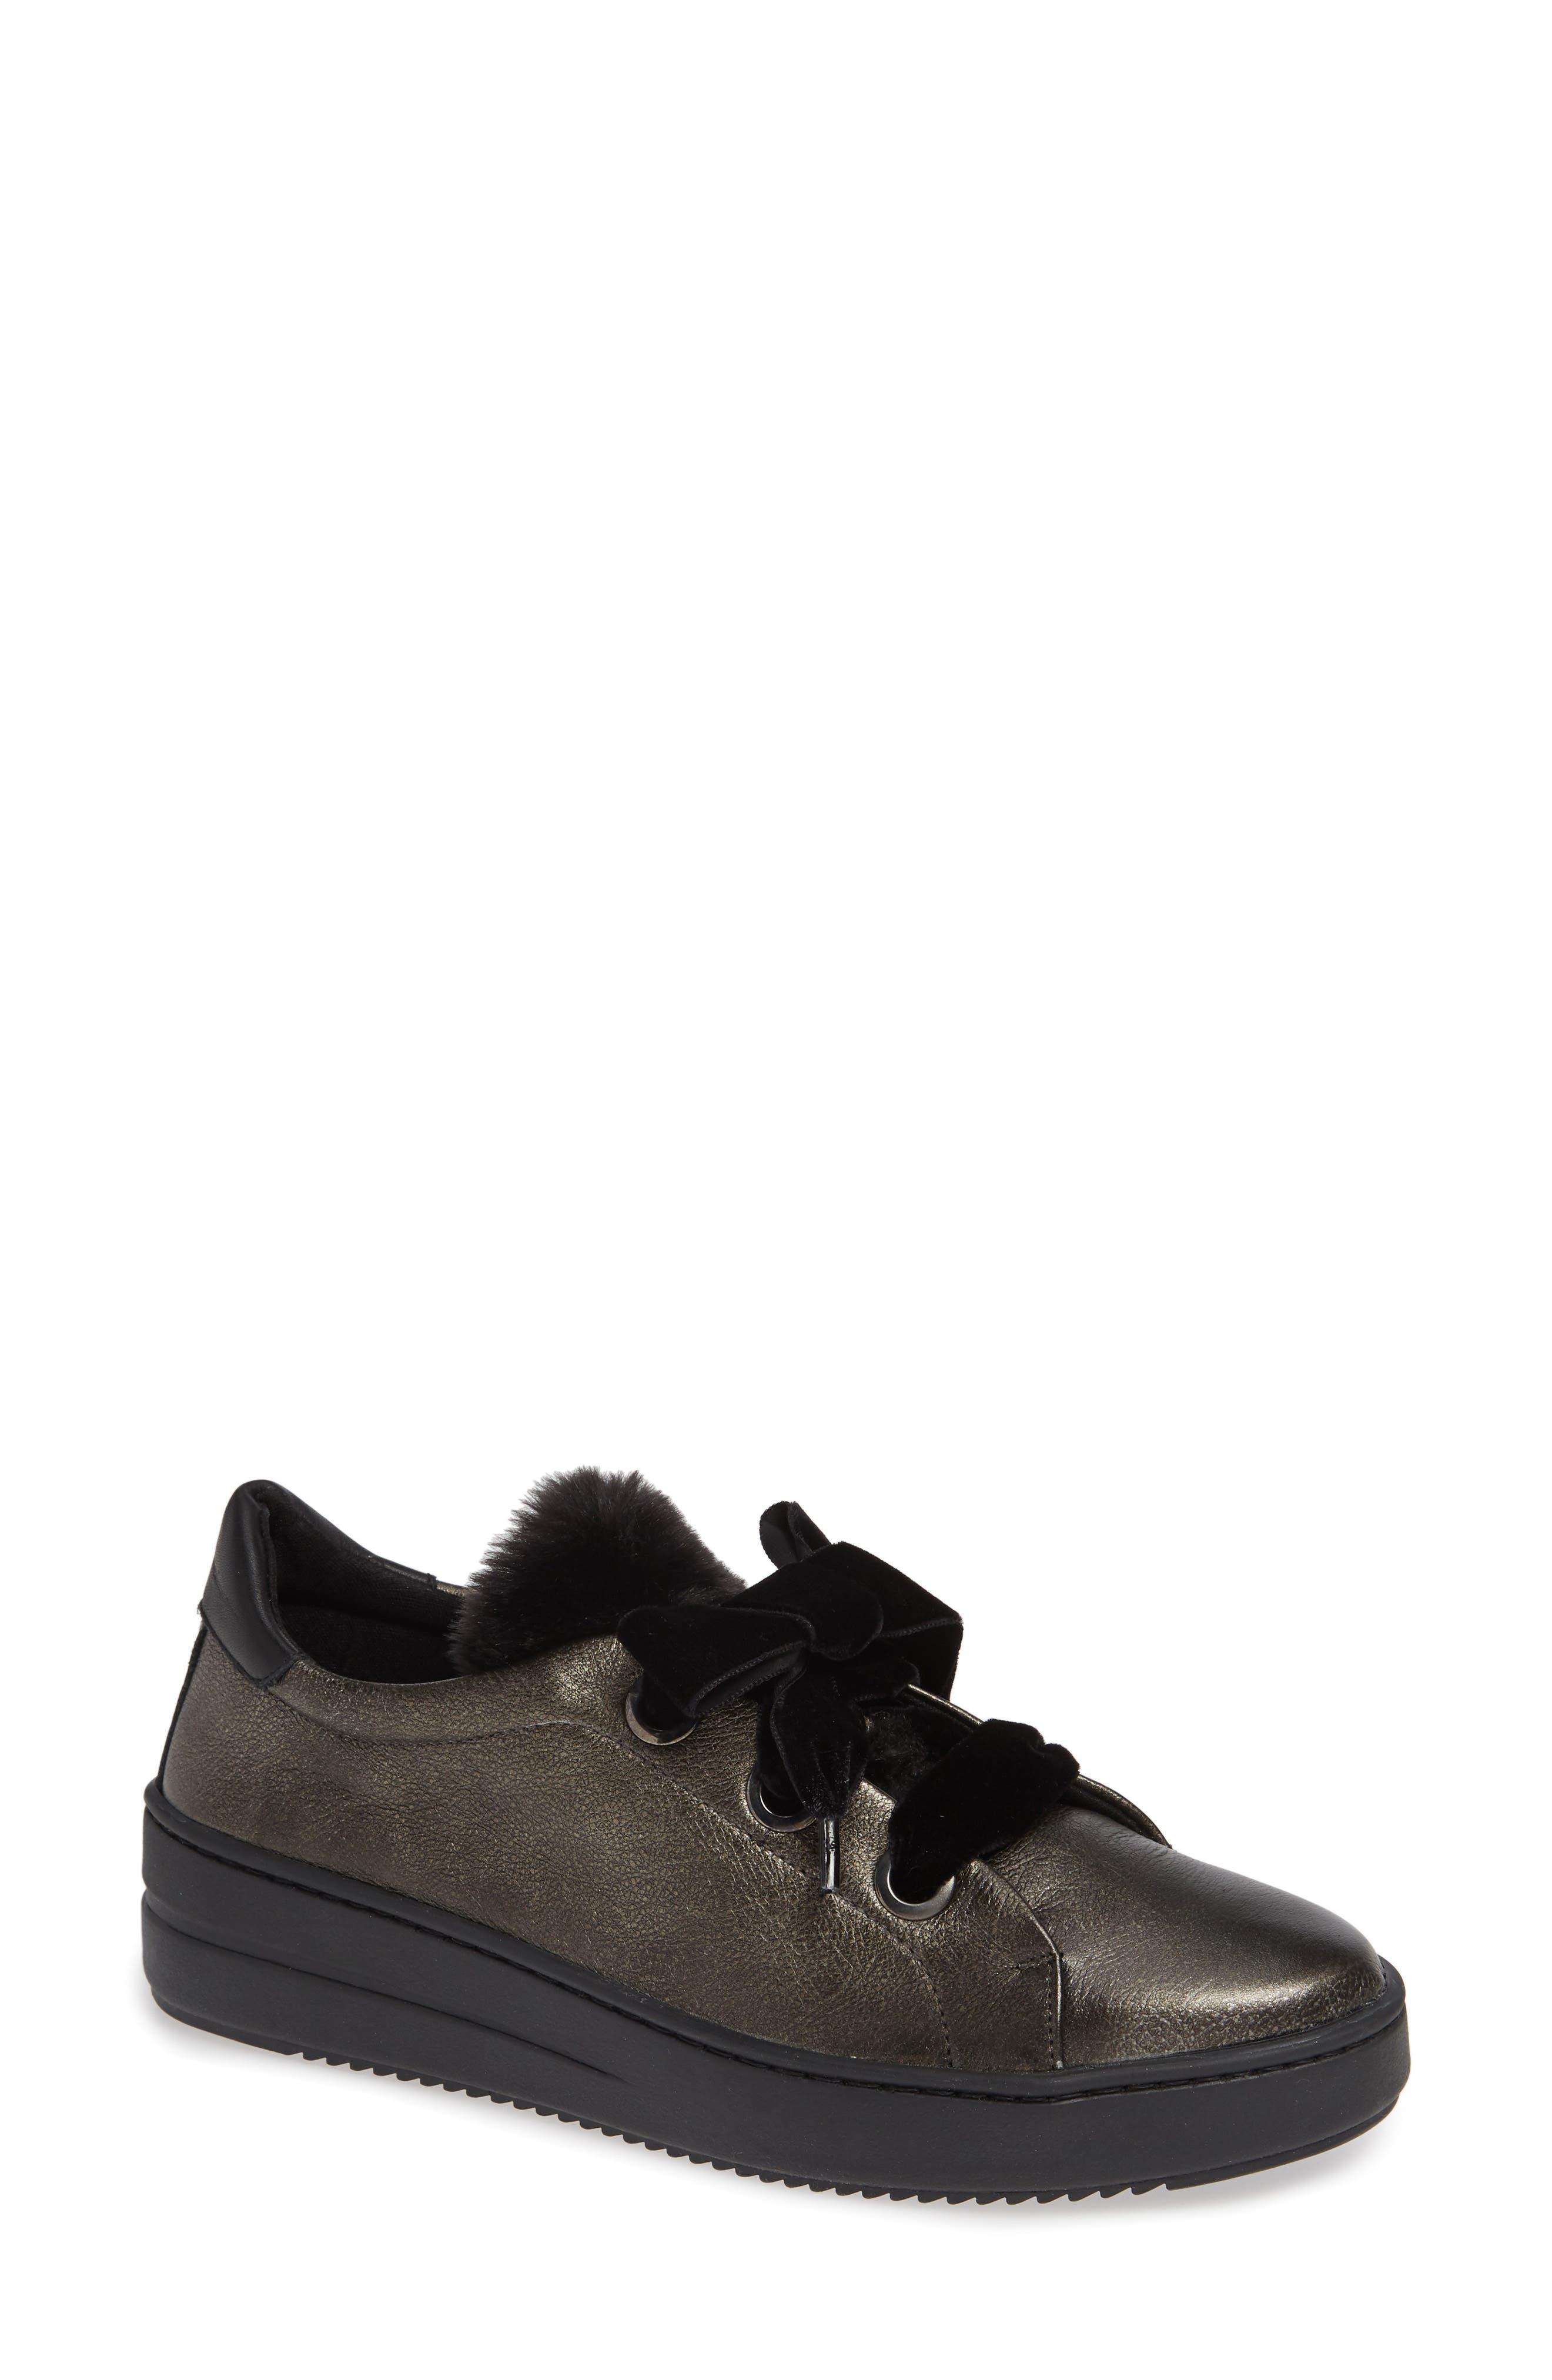 The Flexx Groove Faux-Shearling Trim Sneaker- Grey